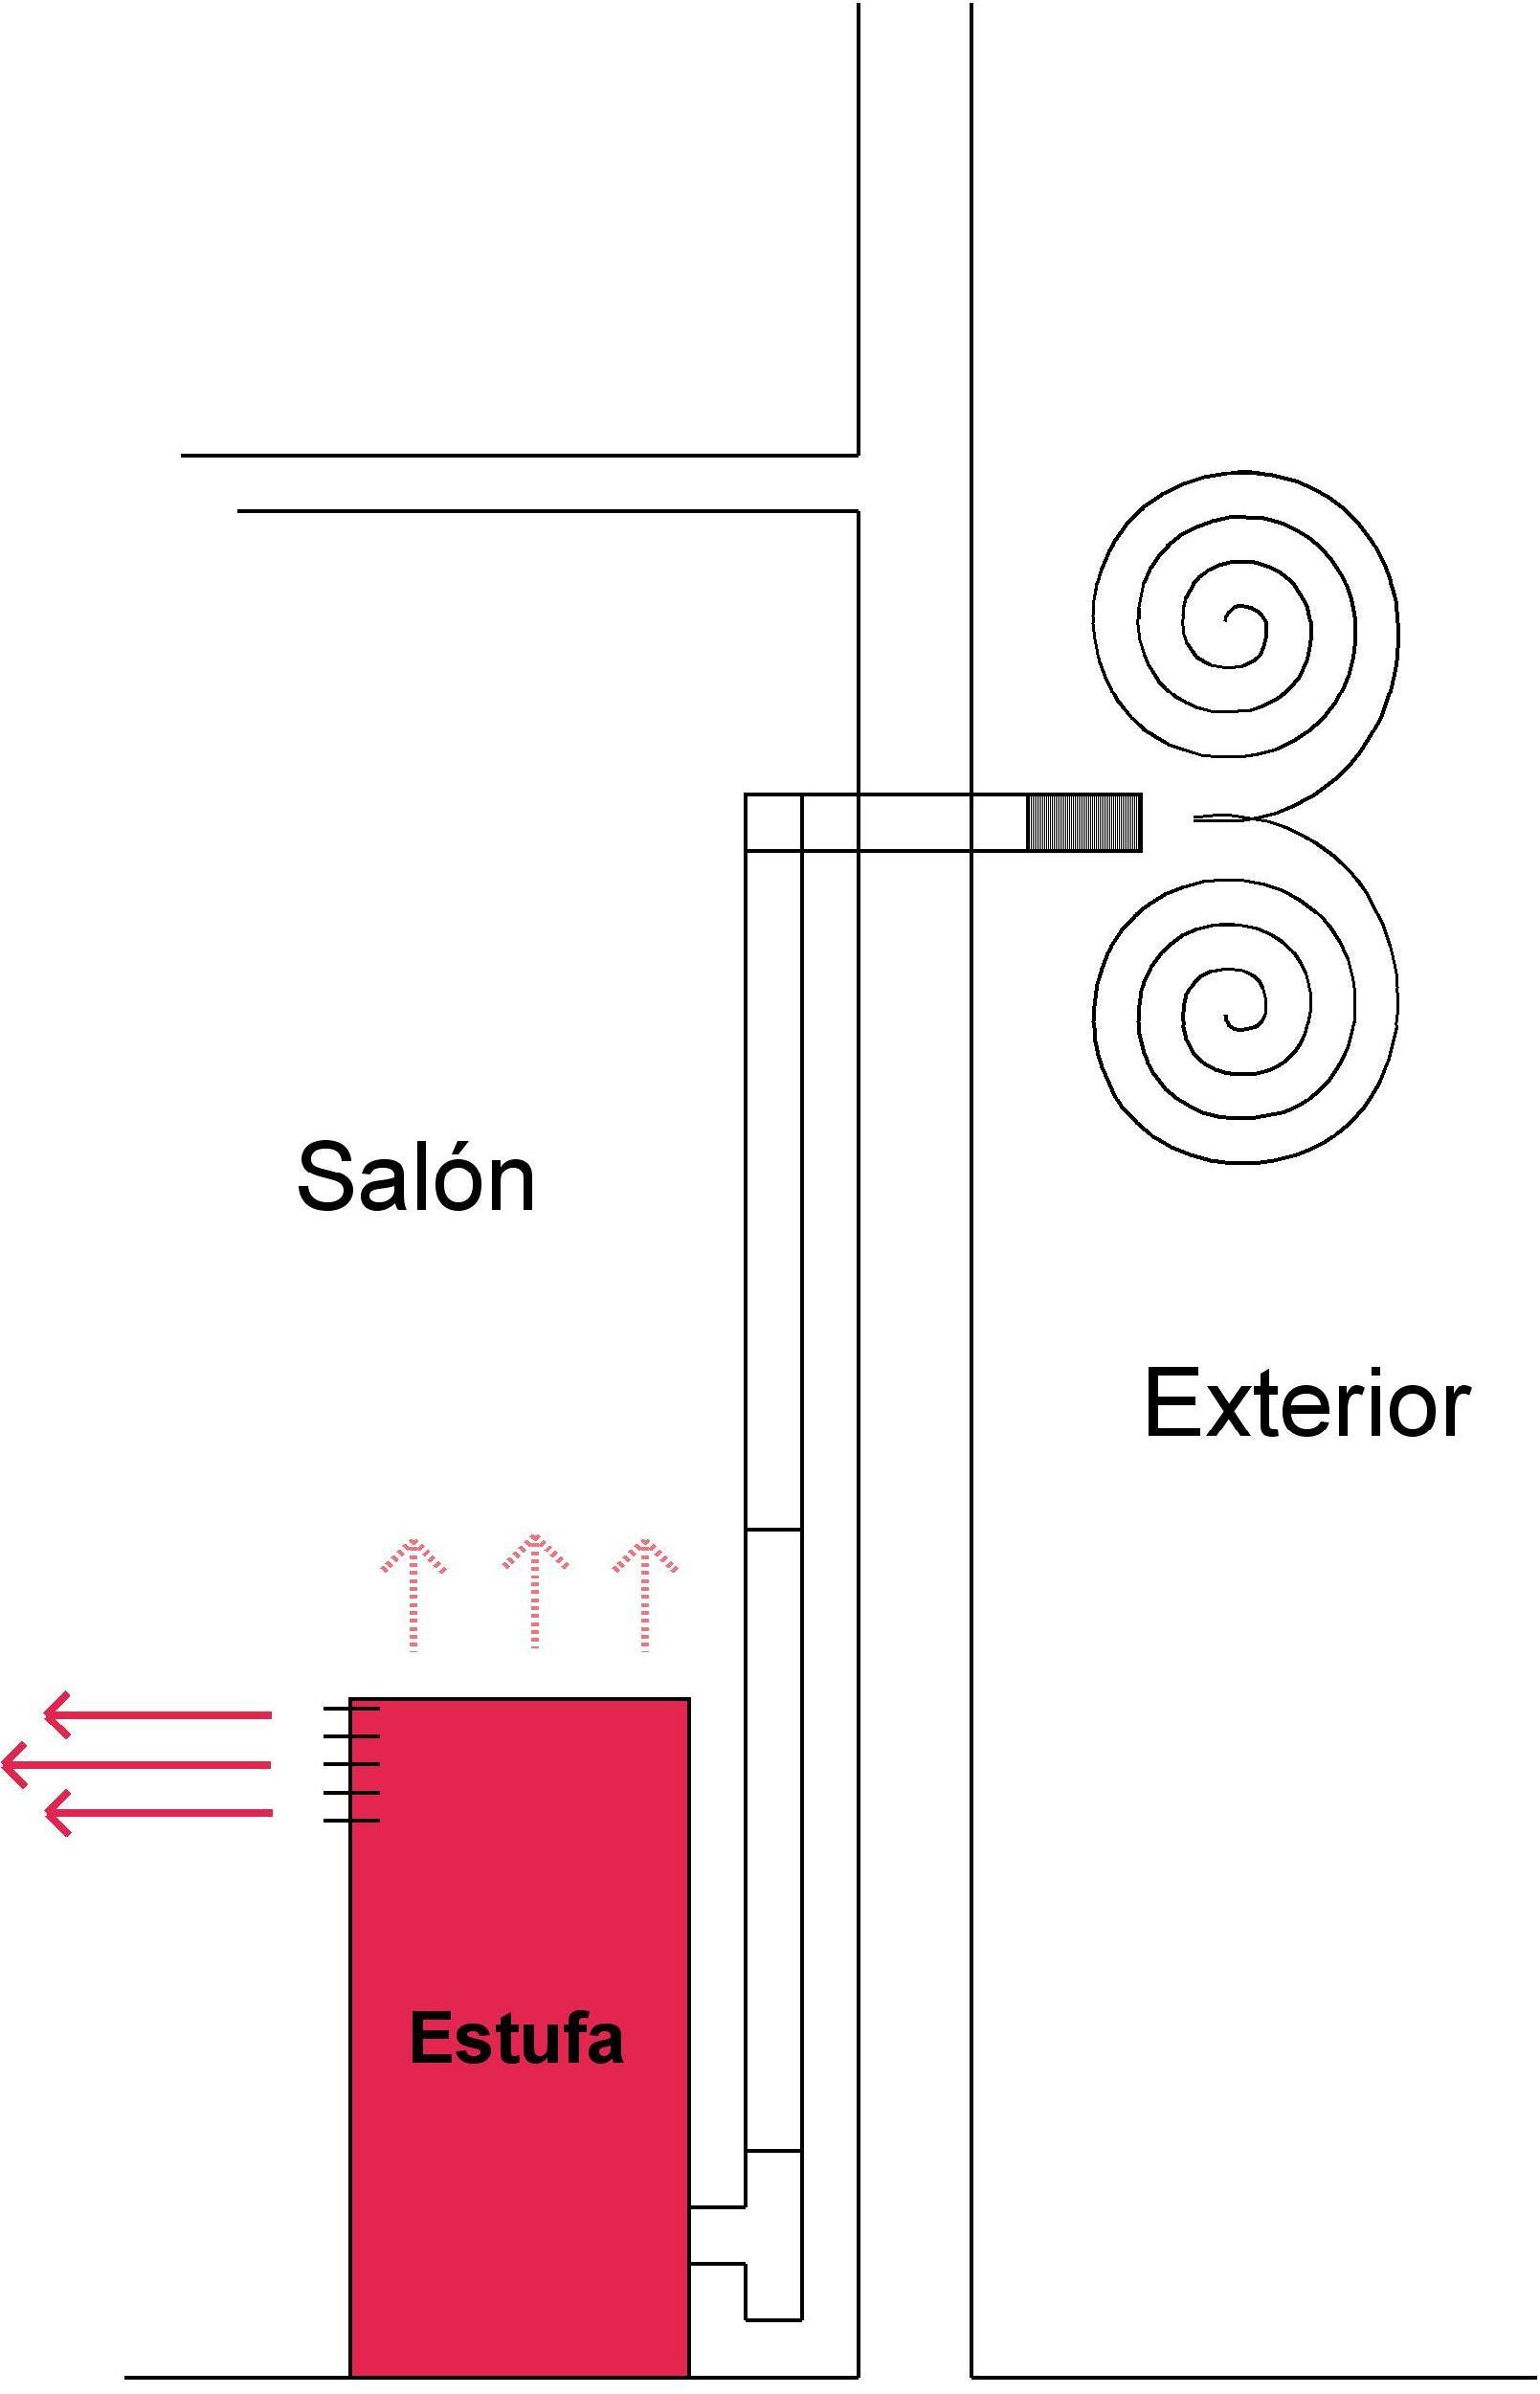 Salida humos estufa pellets horizontal transportes de - Estufas de pellets sin salida de humos ...